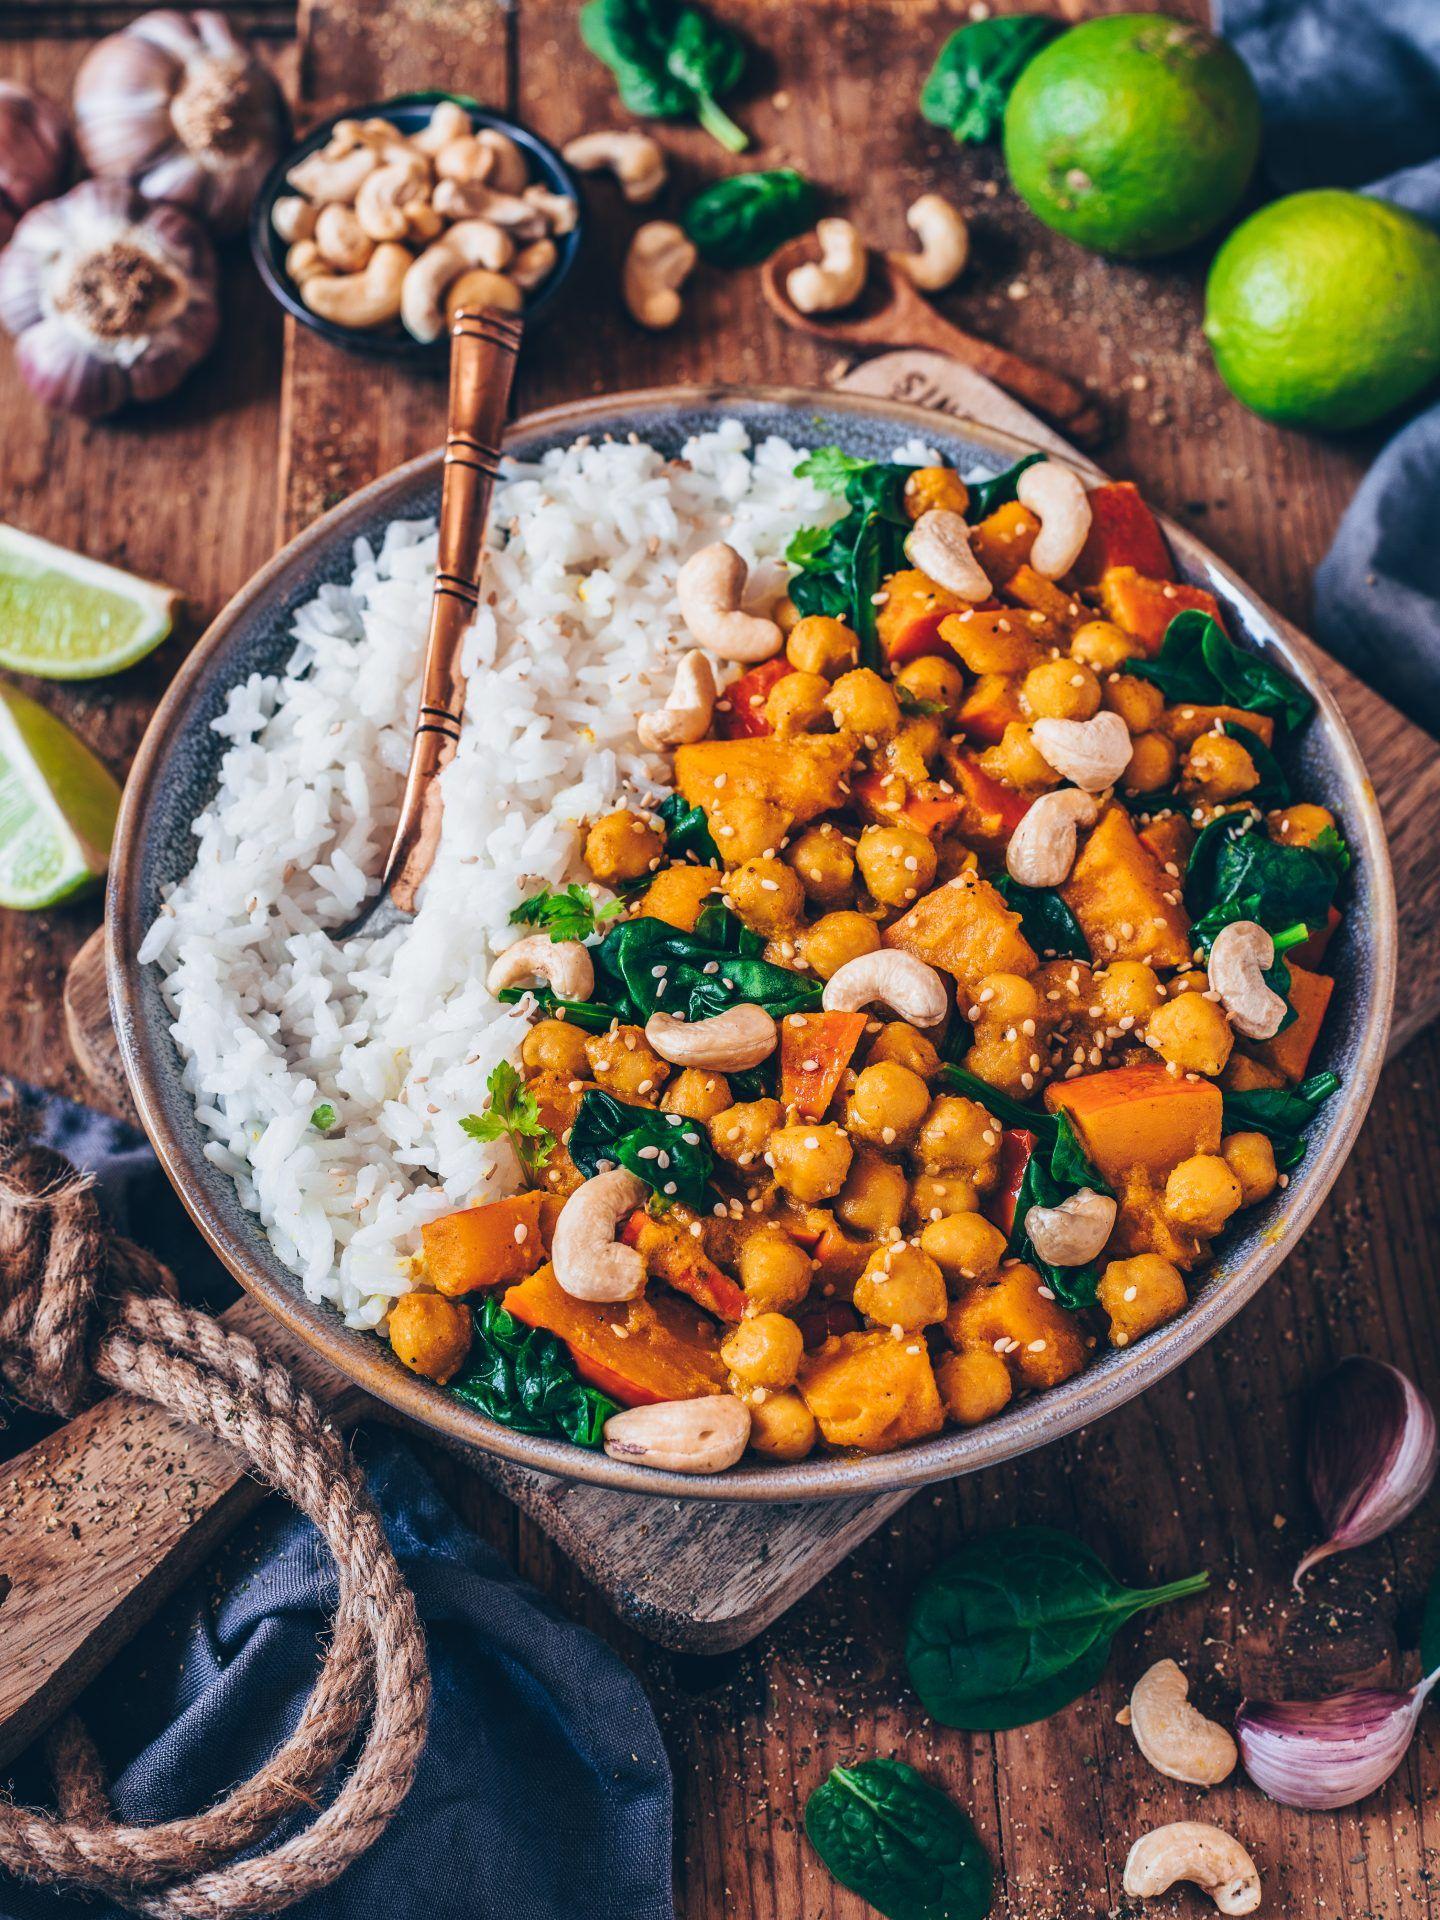 Kürbis-Kichererbsen-Curry (vegan, einfaches Rezept) - Bianca Zapatka | Rezepte #meals